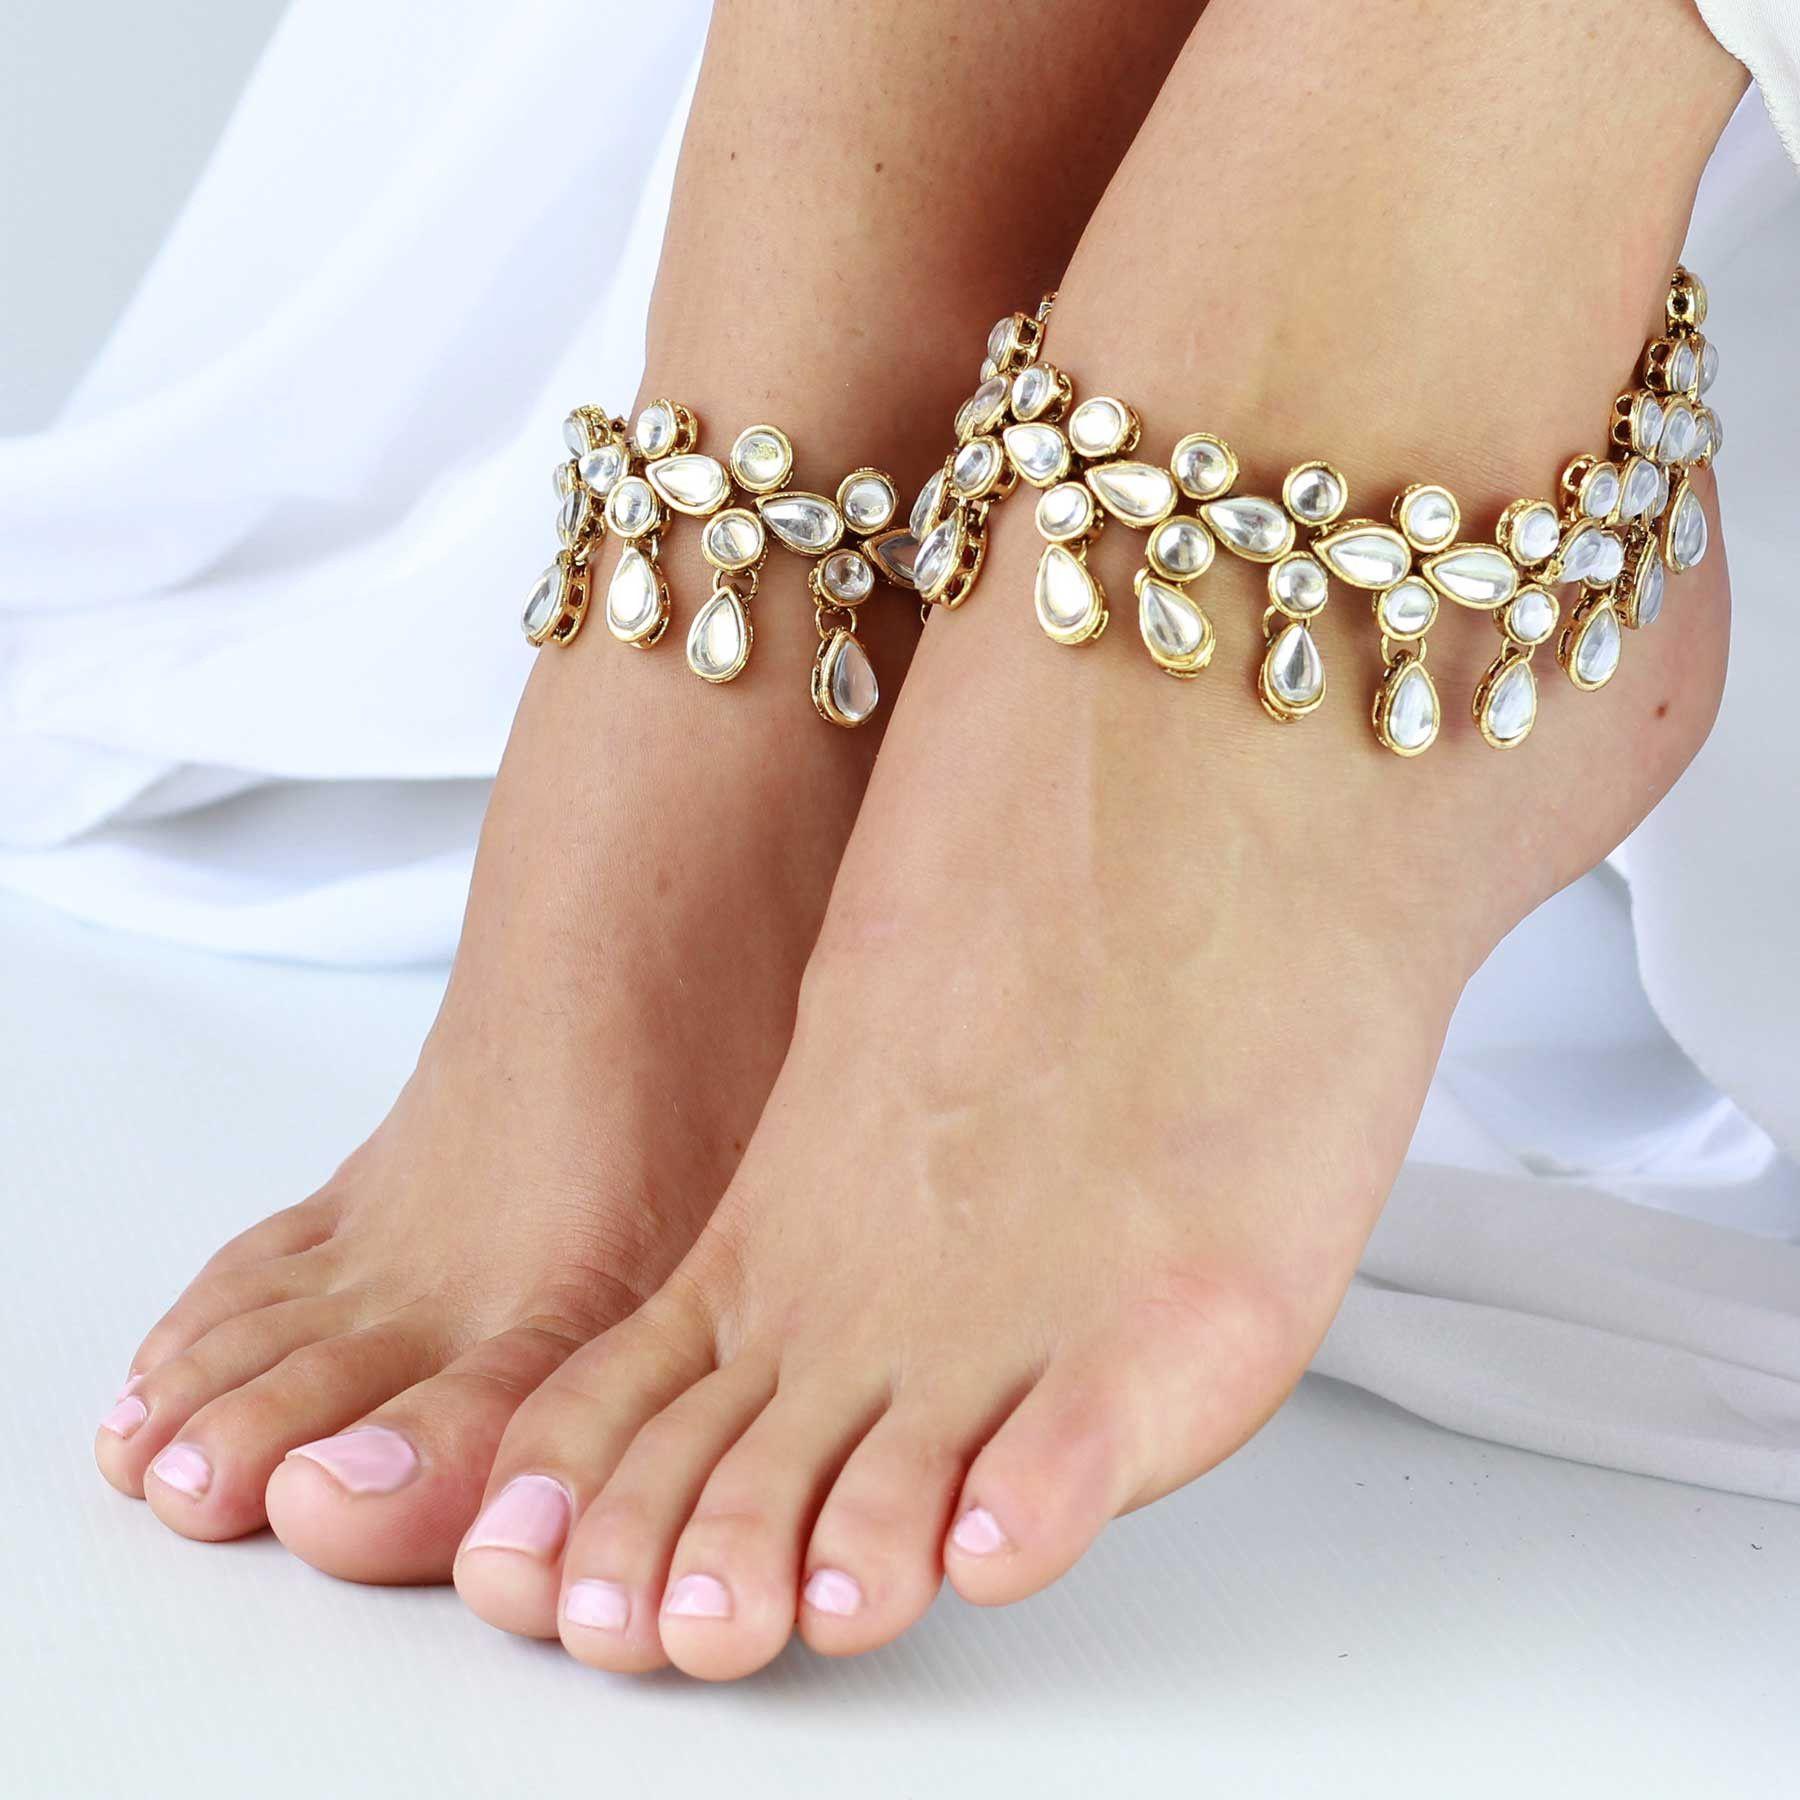 Anklet amerita by forever soles forever soles bridal shoes